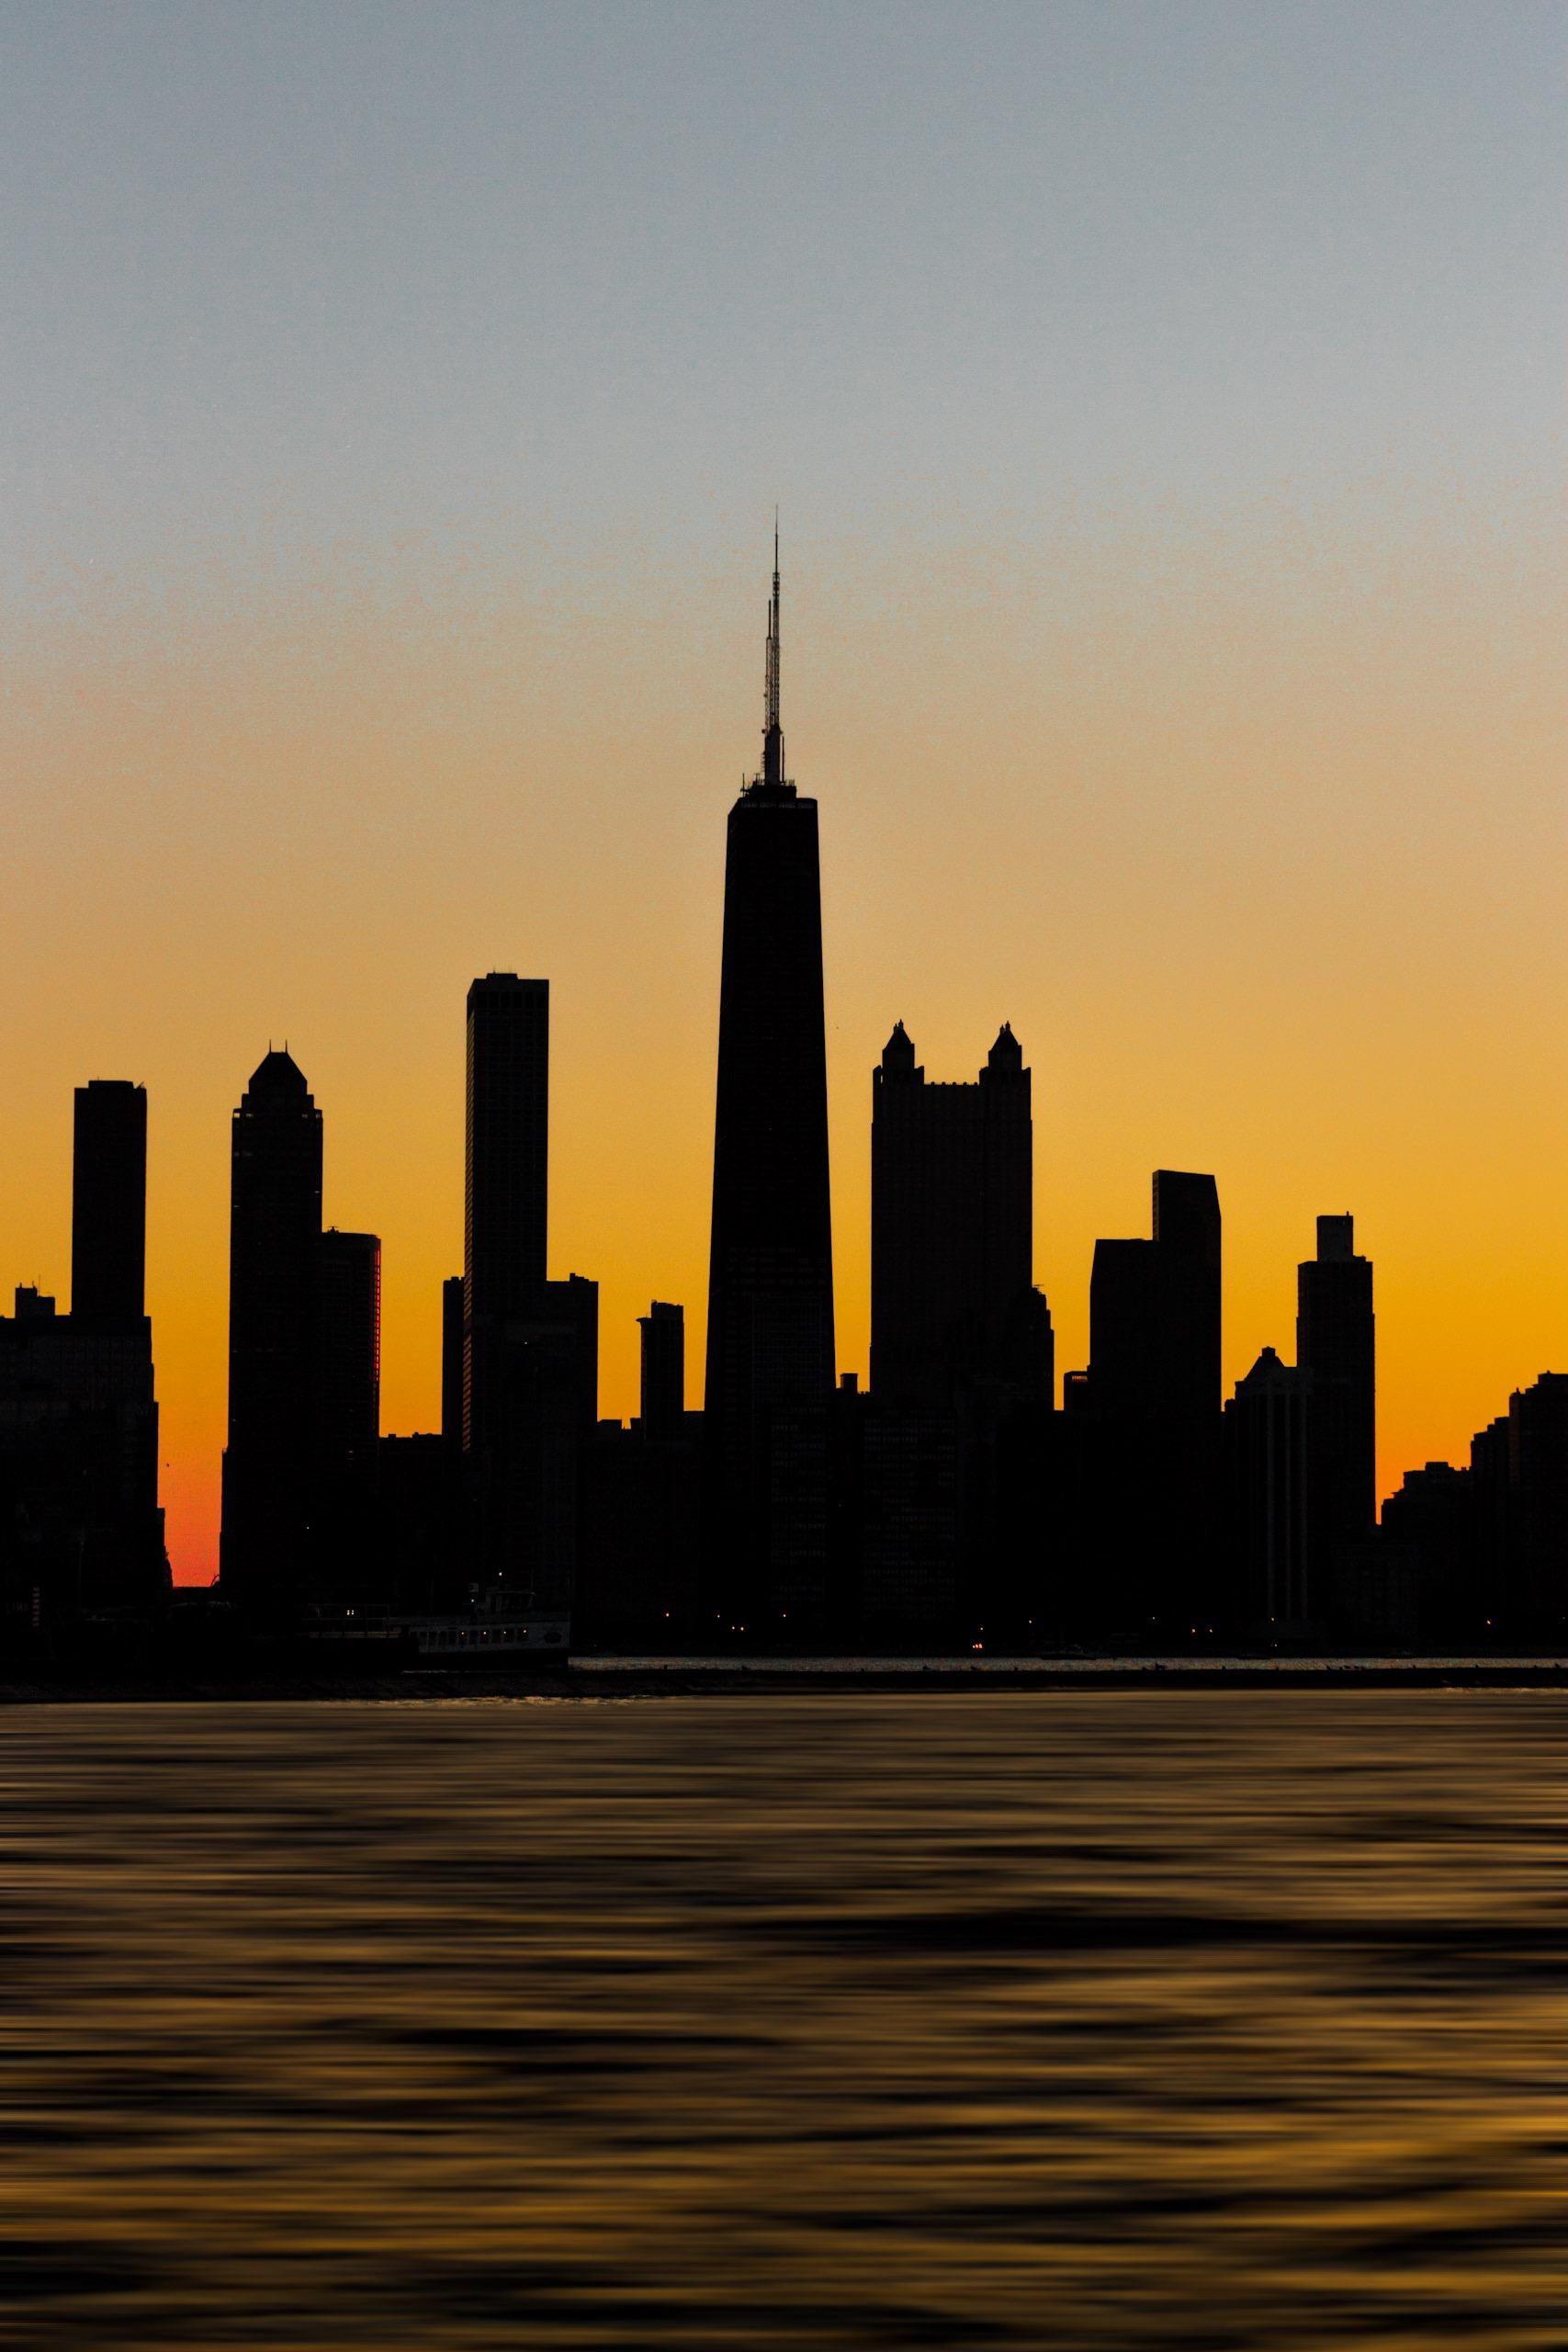 Silhouette Of Buildings